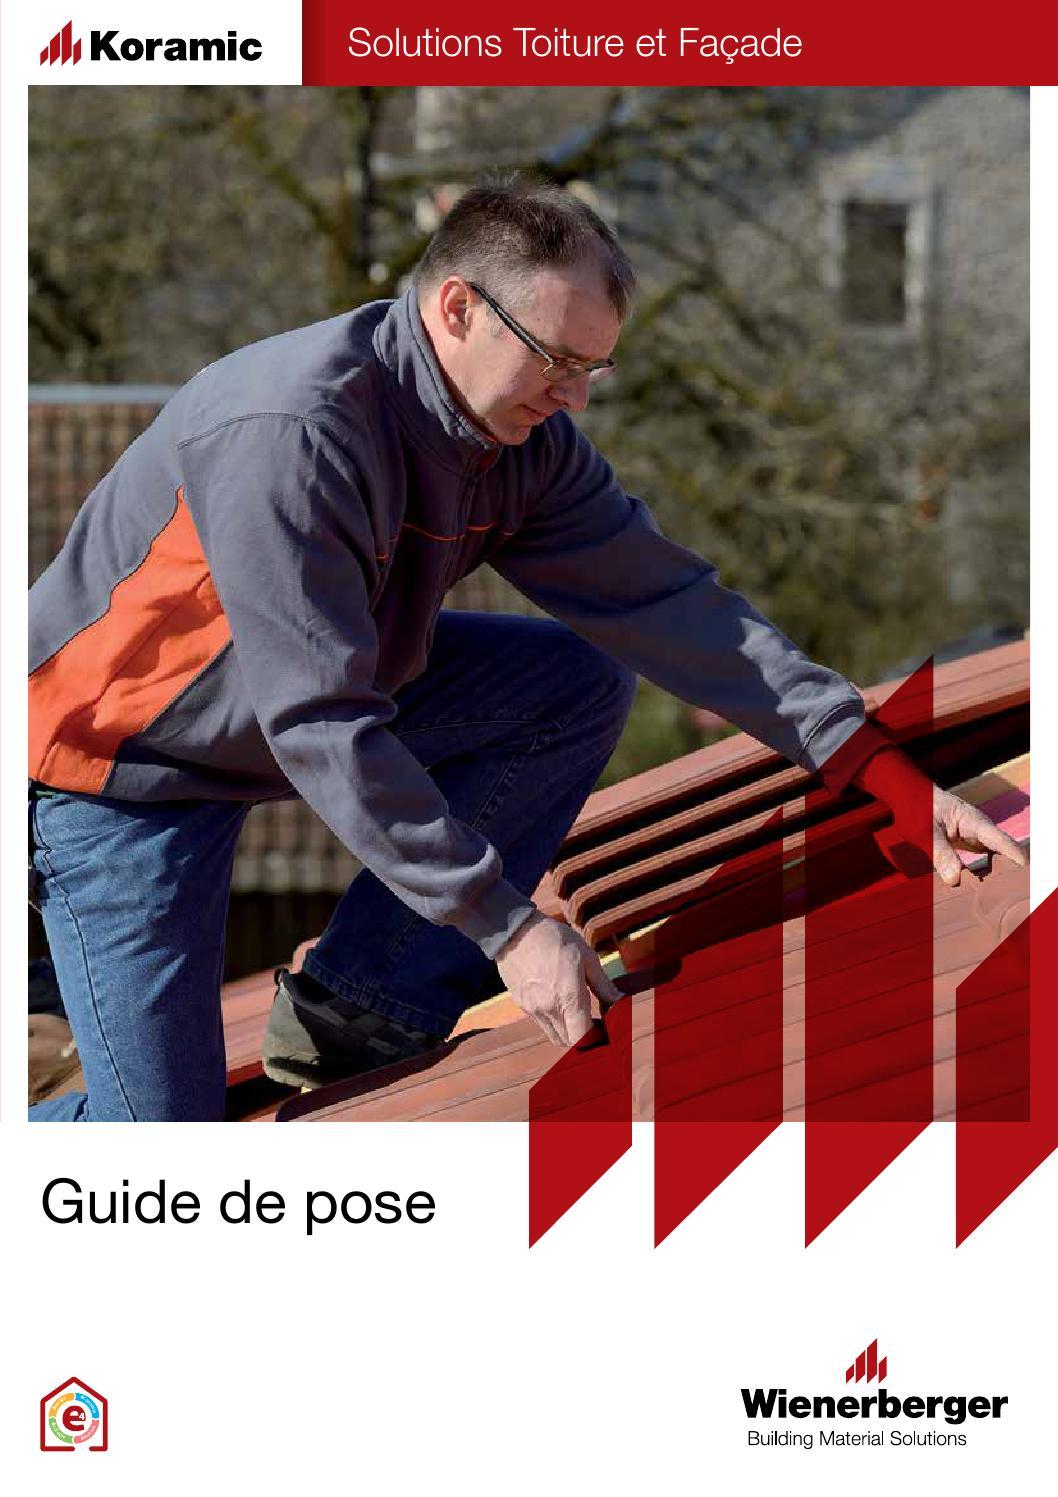 Documentation Guide De Pose Koramic By Wienerberger Ag Issuu